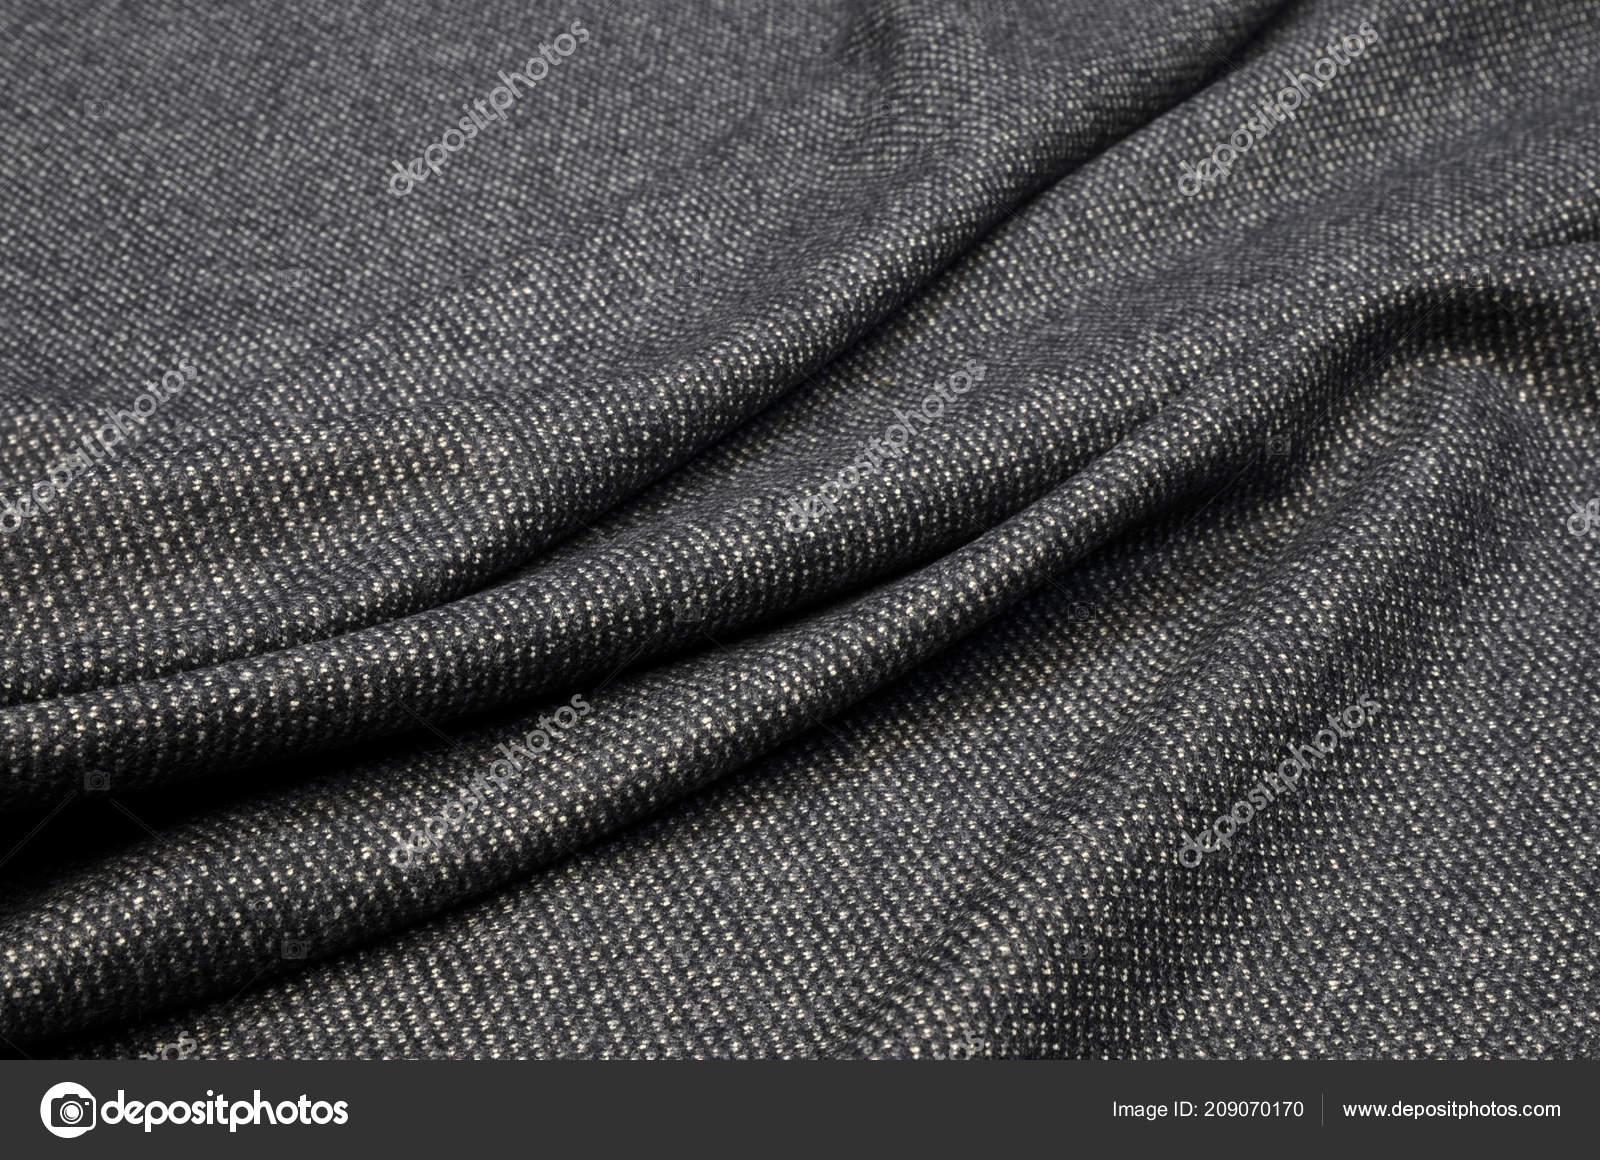 4099248052b8 Vestito Tessuto Lana Cachemire Tweed Grigio Bianco — Foto Stock ...